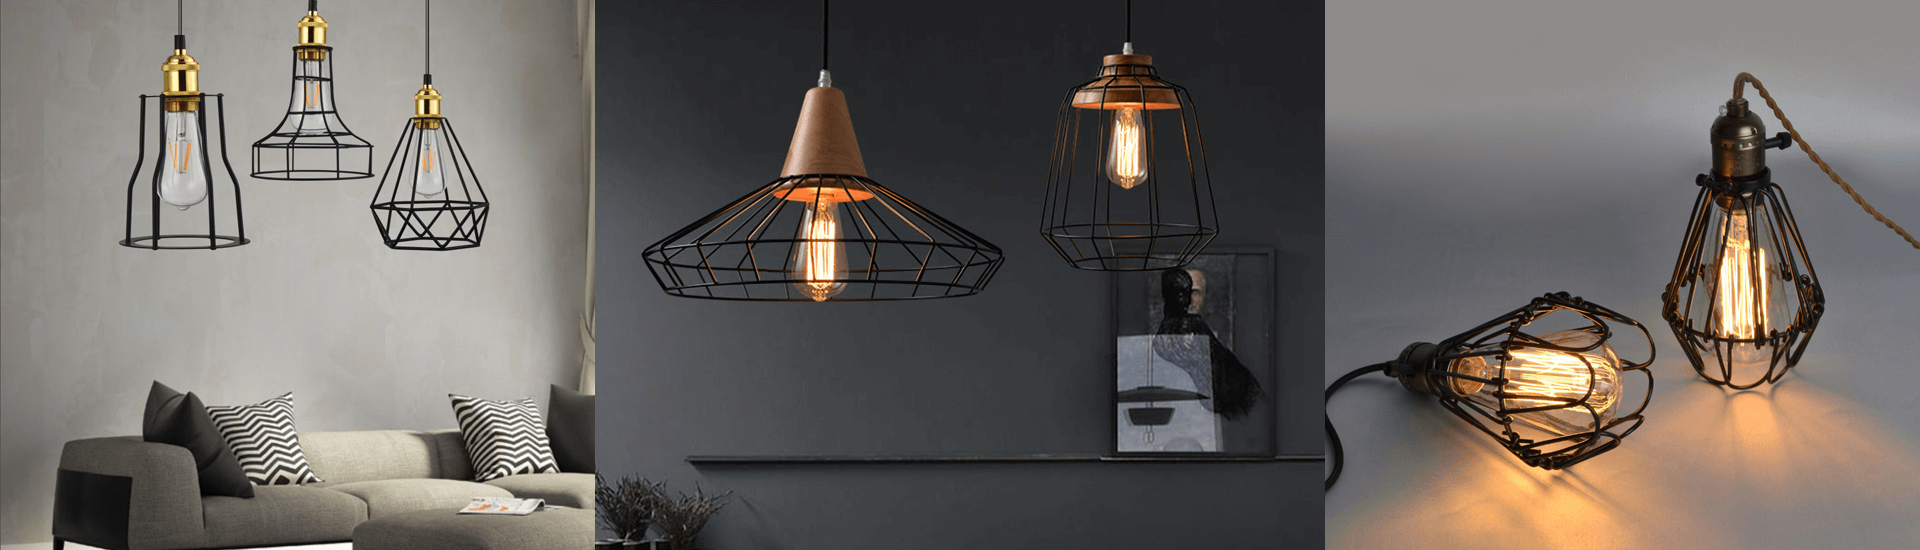 Iron cage pendant light